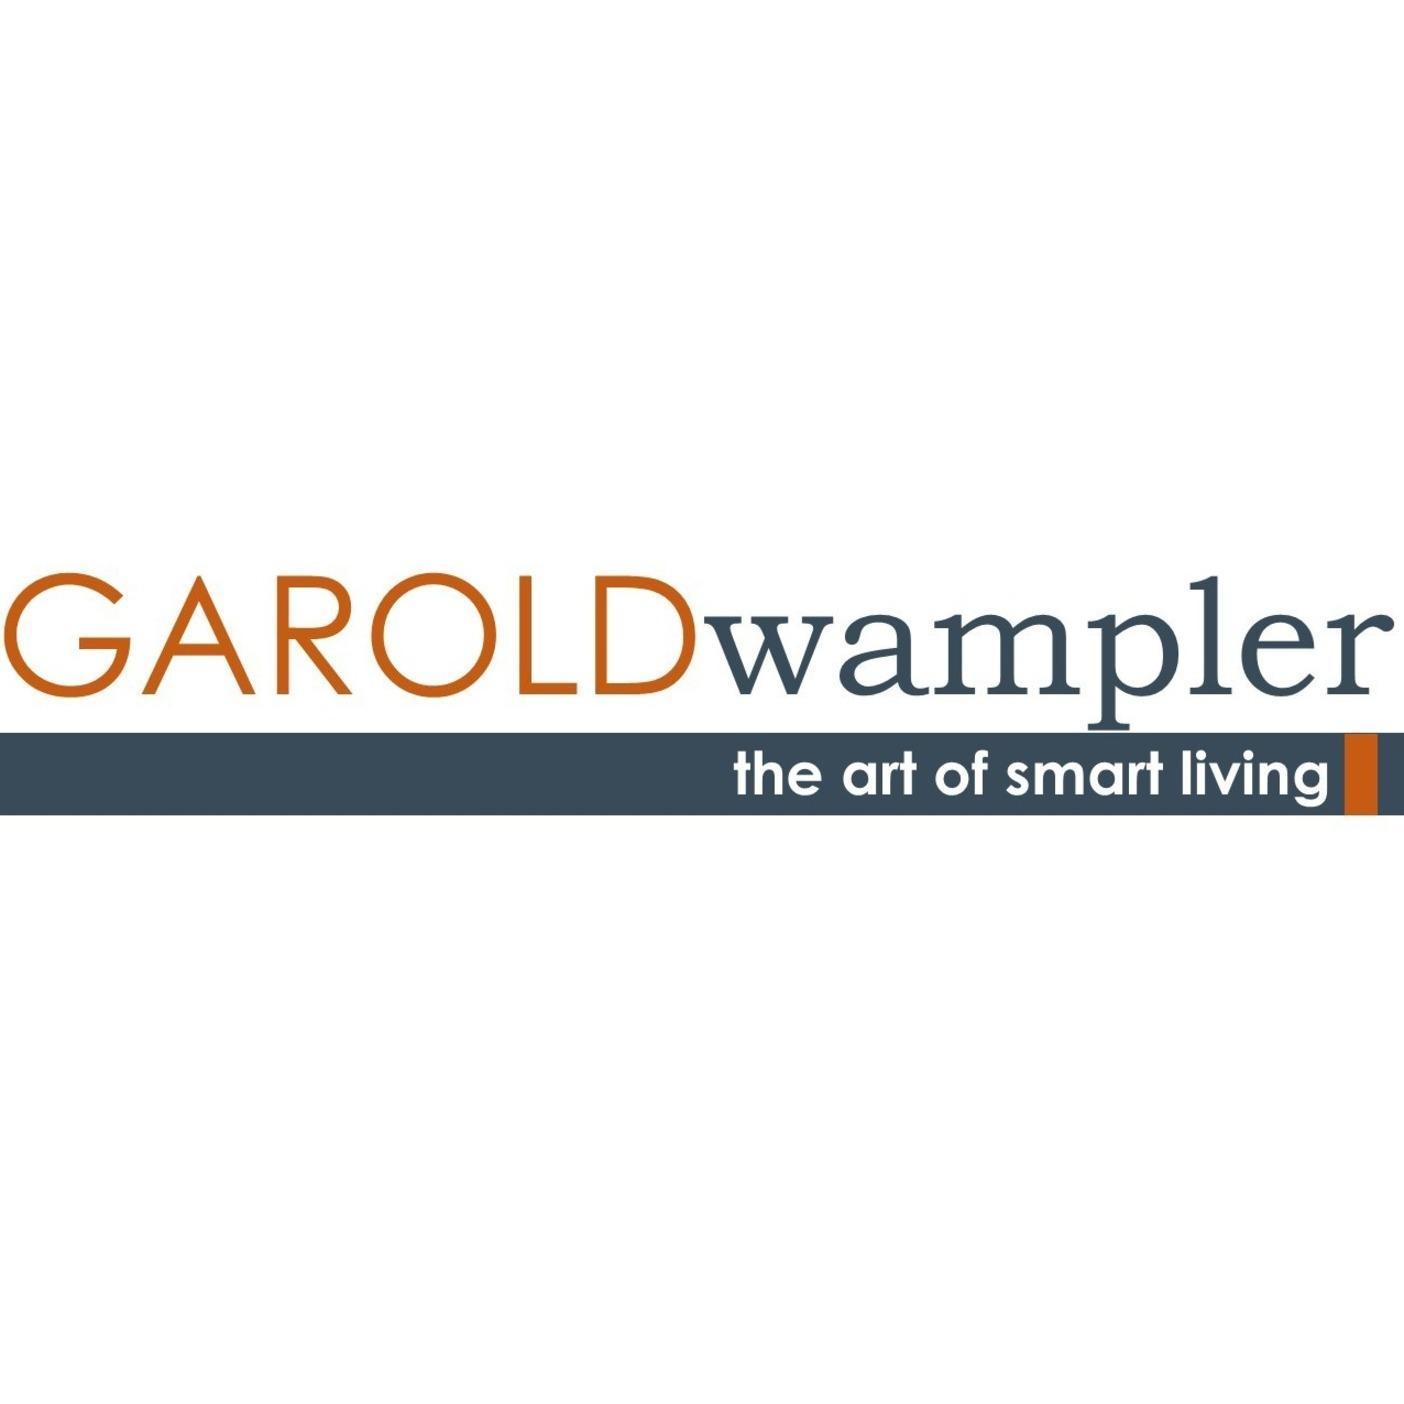 Garold Wampler | Ascent Real Estate, Inc.